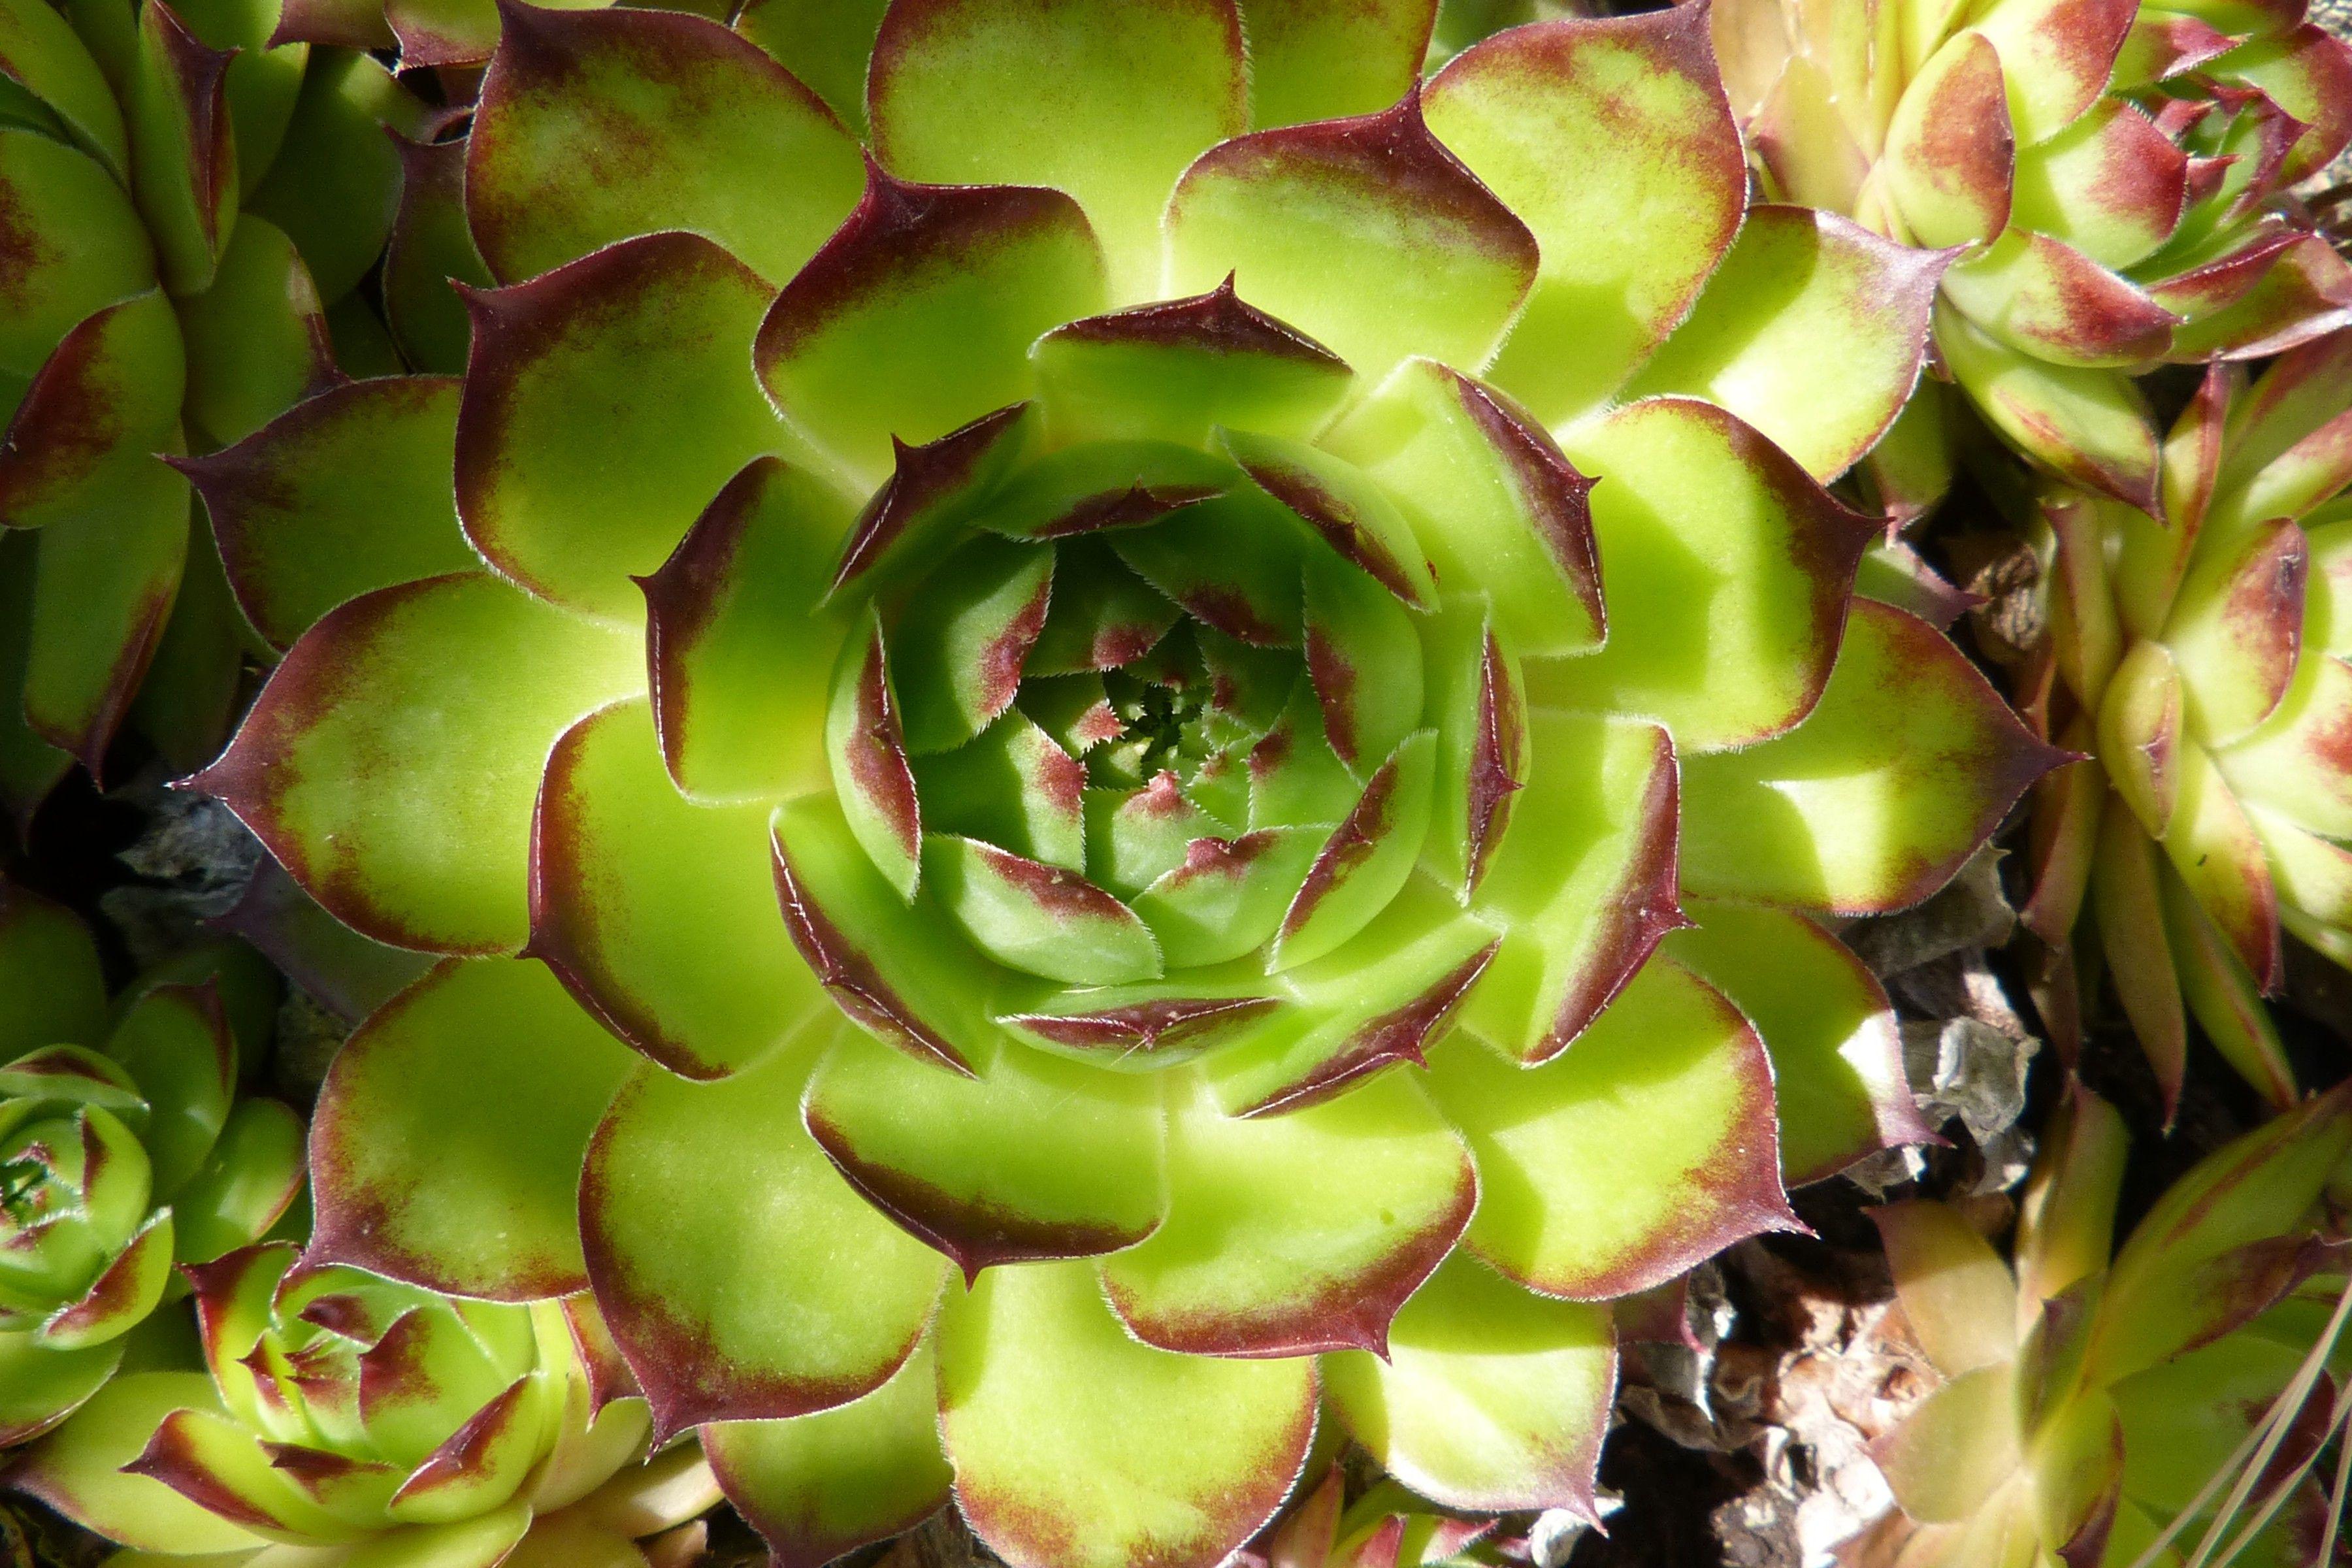 Plantes grasses : les bases - Gerbeaud